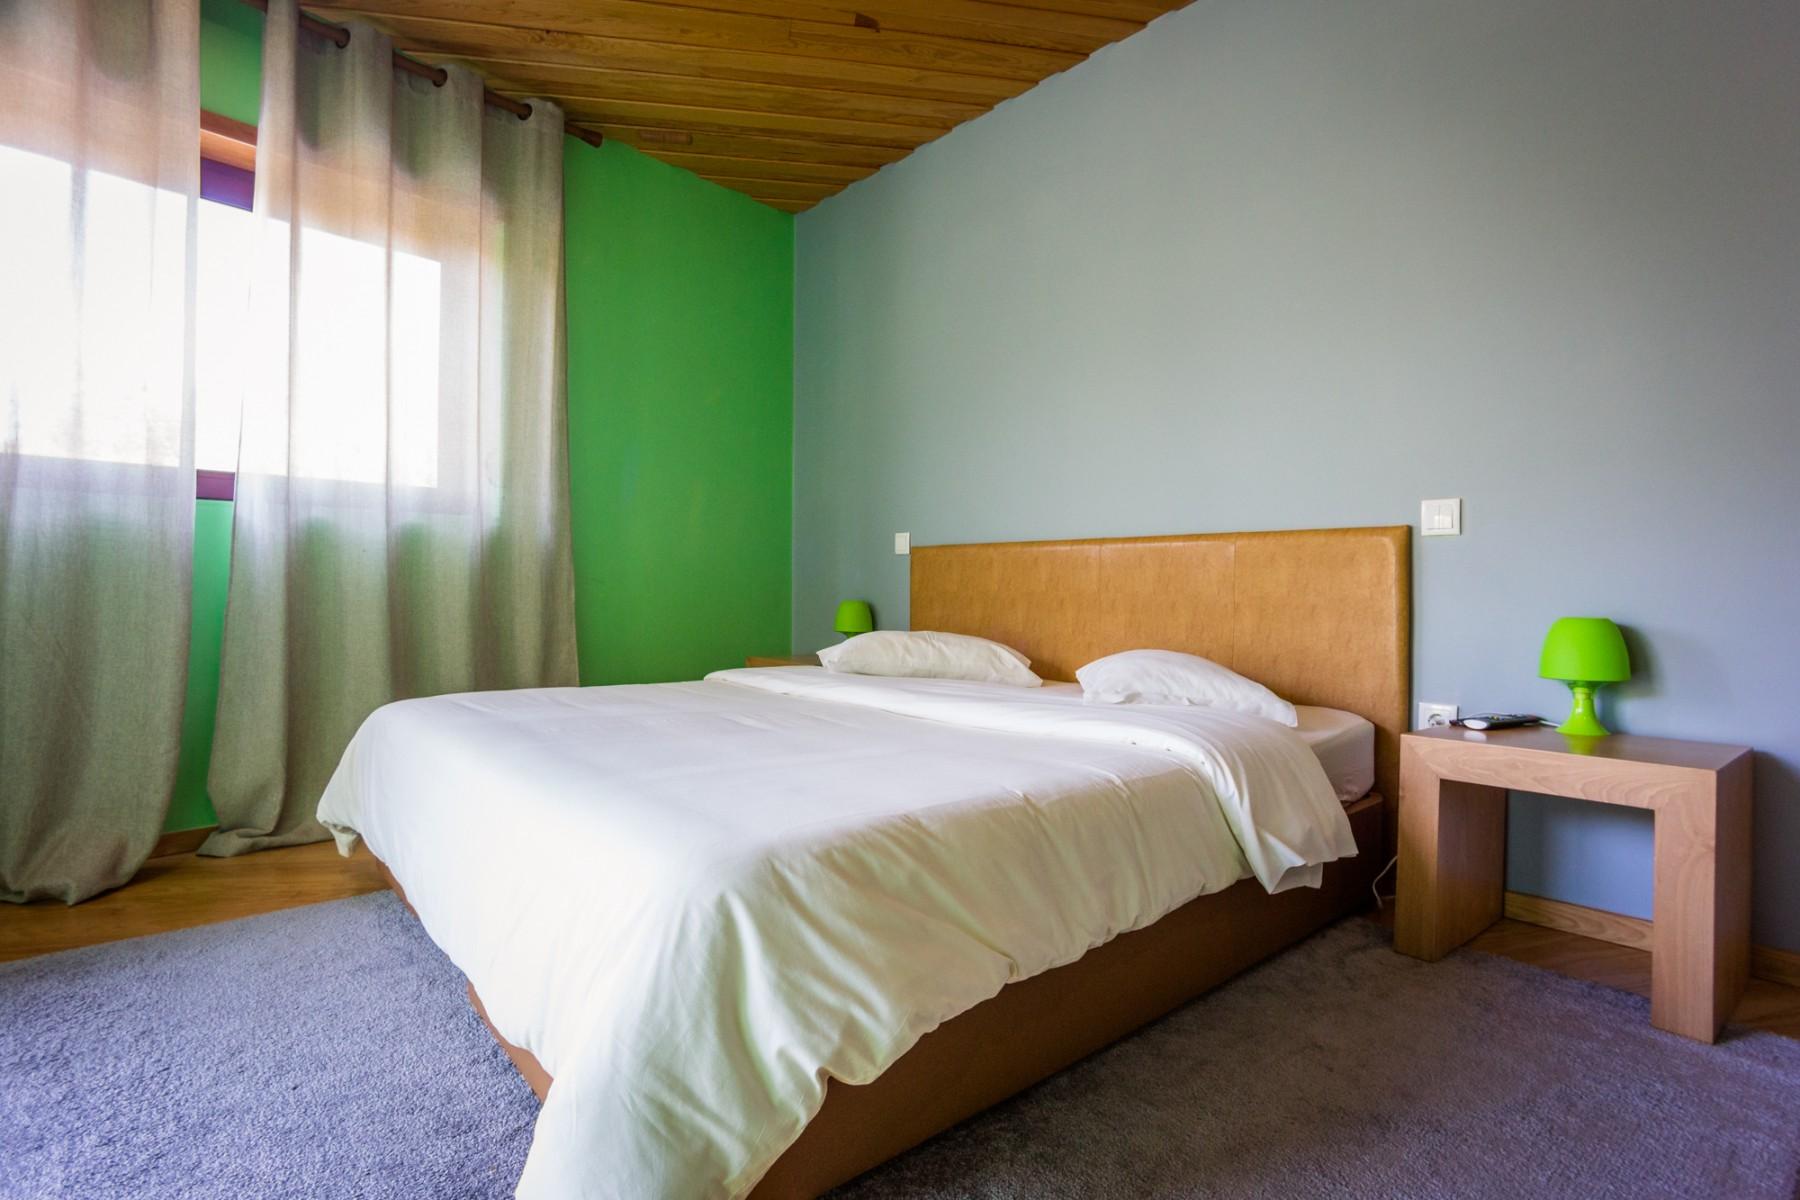 Bed And Breakfast In Parada Do Bouro Quartos Da Quinta Do Lago - Lago bed